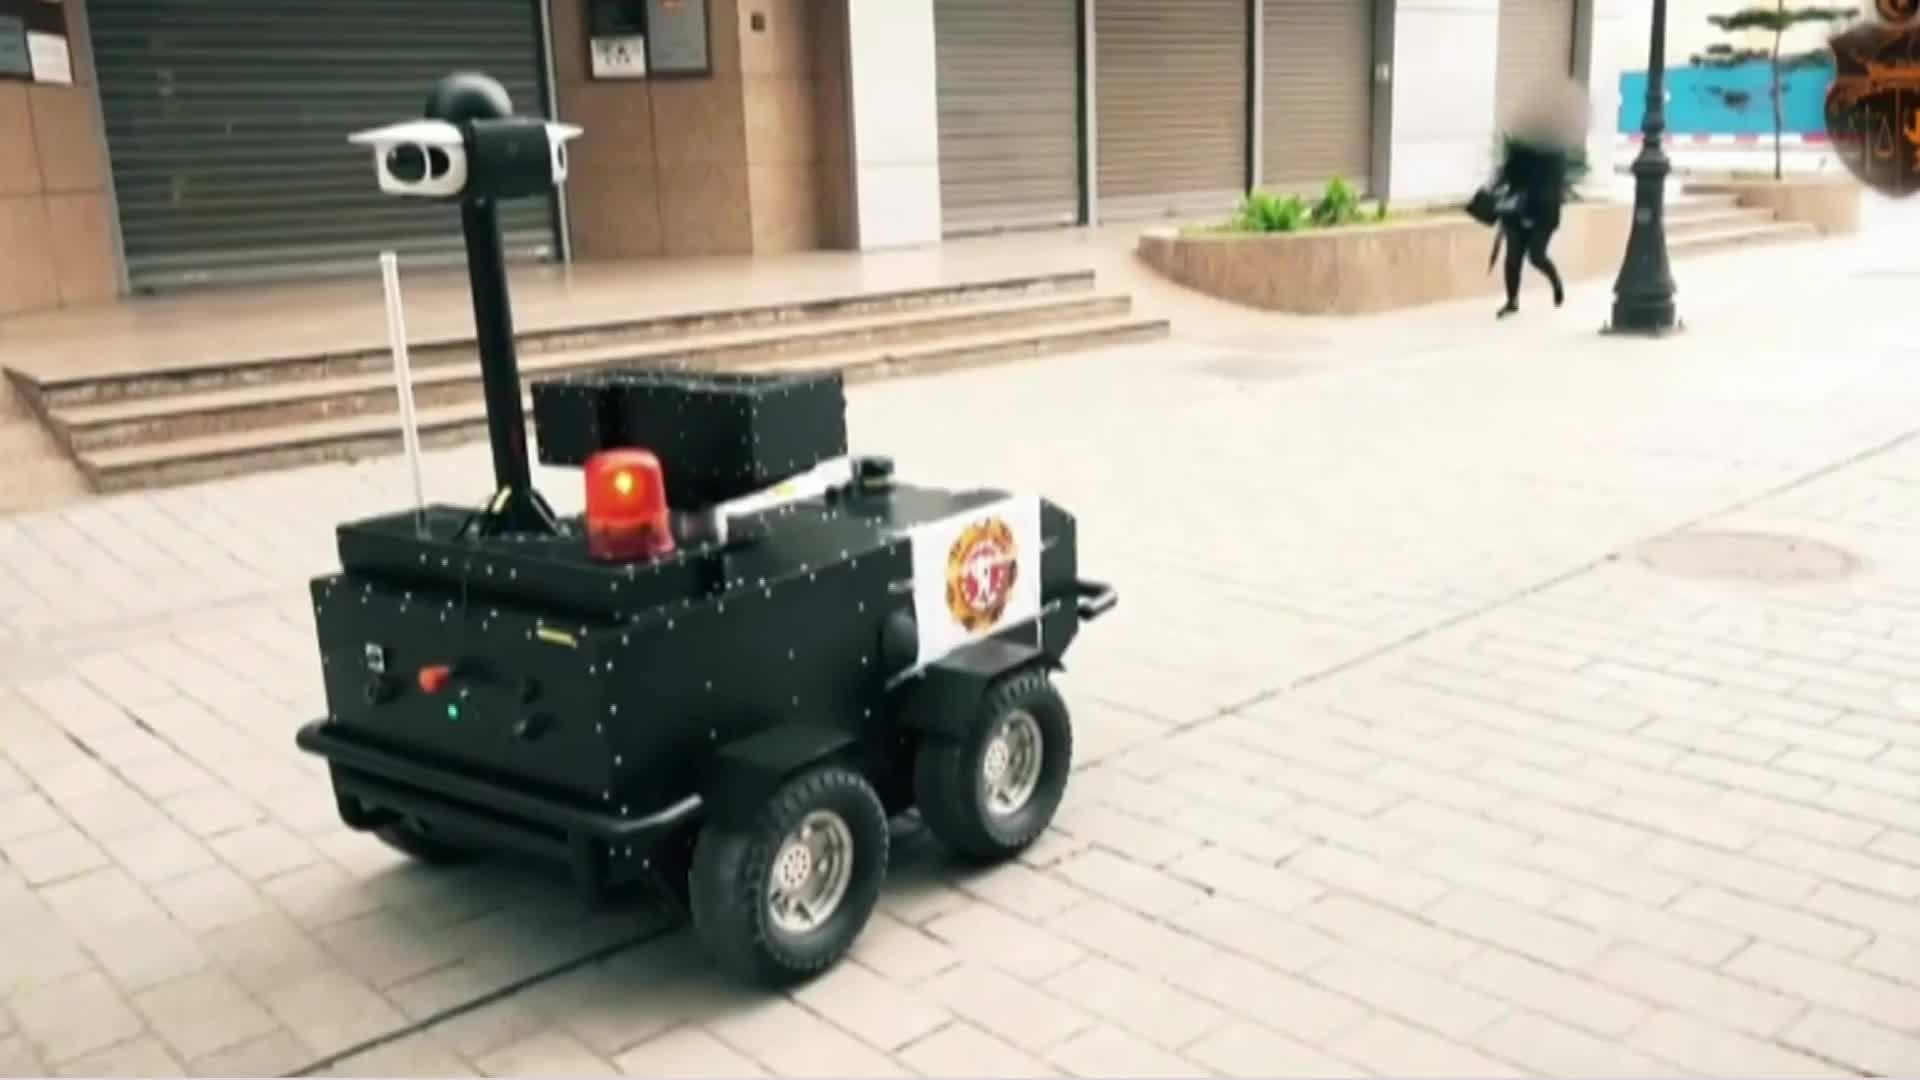 Tunisia: P-Guard robots patrol streets during coronavirus lockdown ...